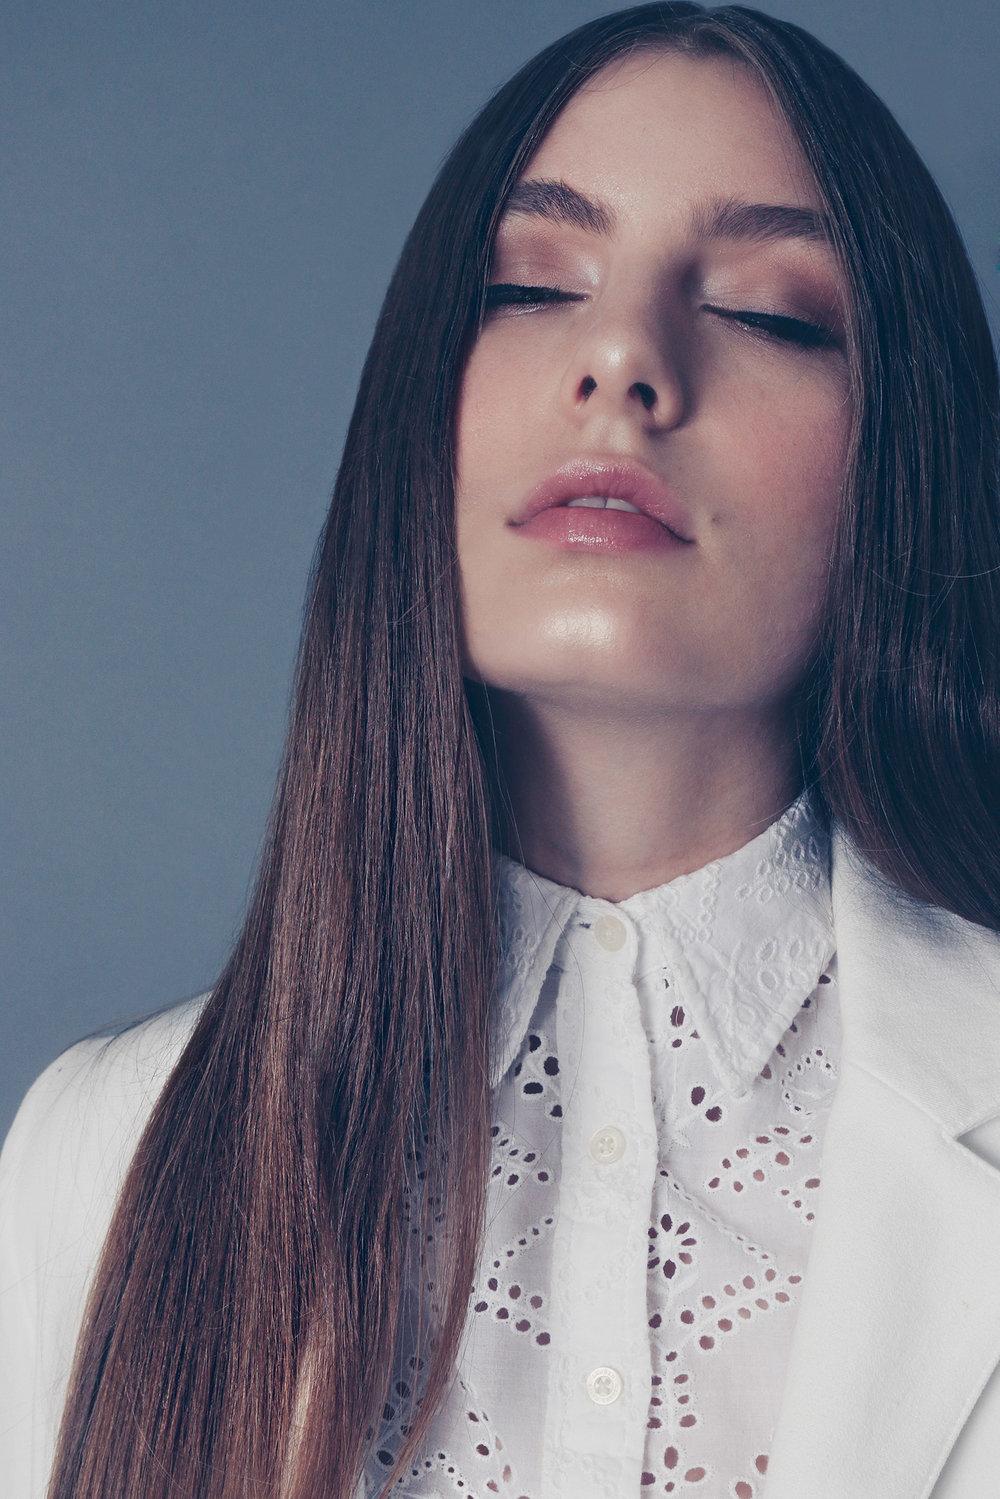 amora_beauty_studio_home_woman_fashion_model_indie_white_coat_eyes_closed.jpg